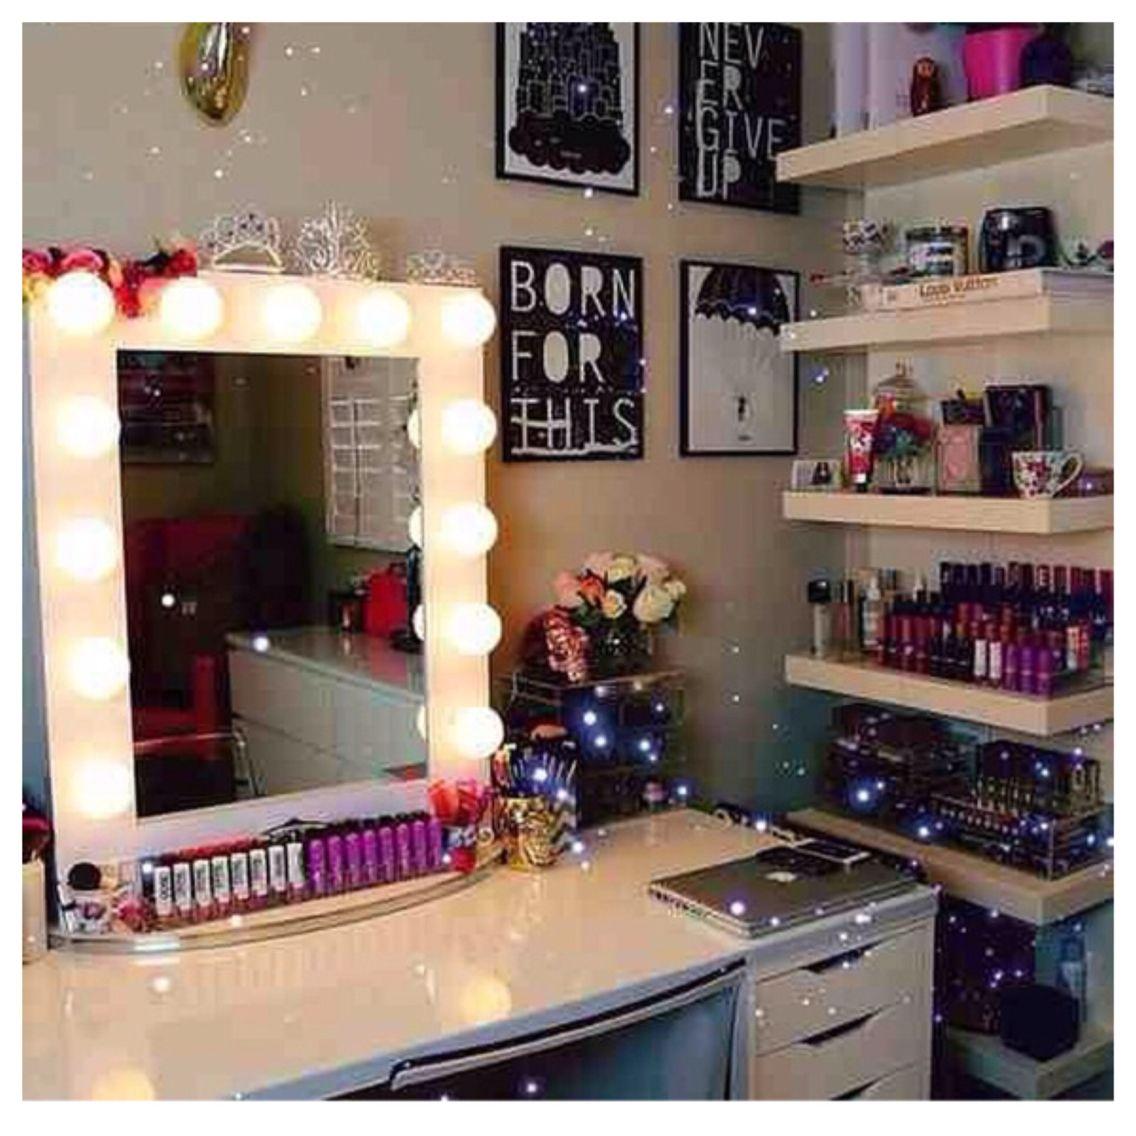 Organized make up area